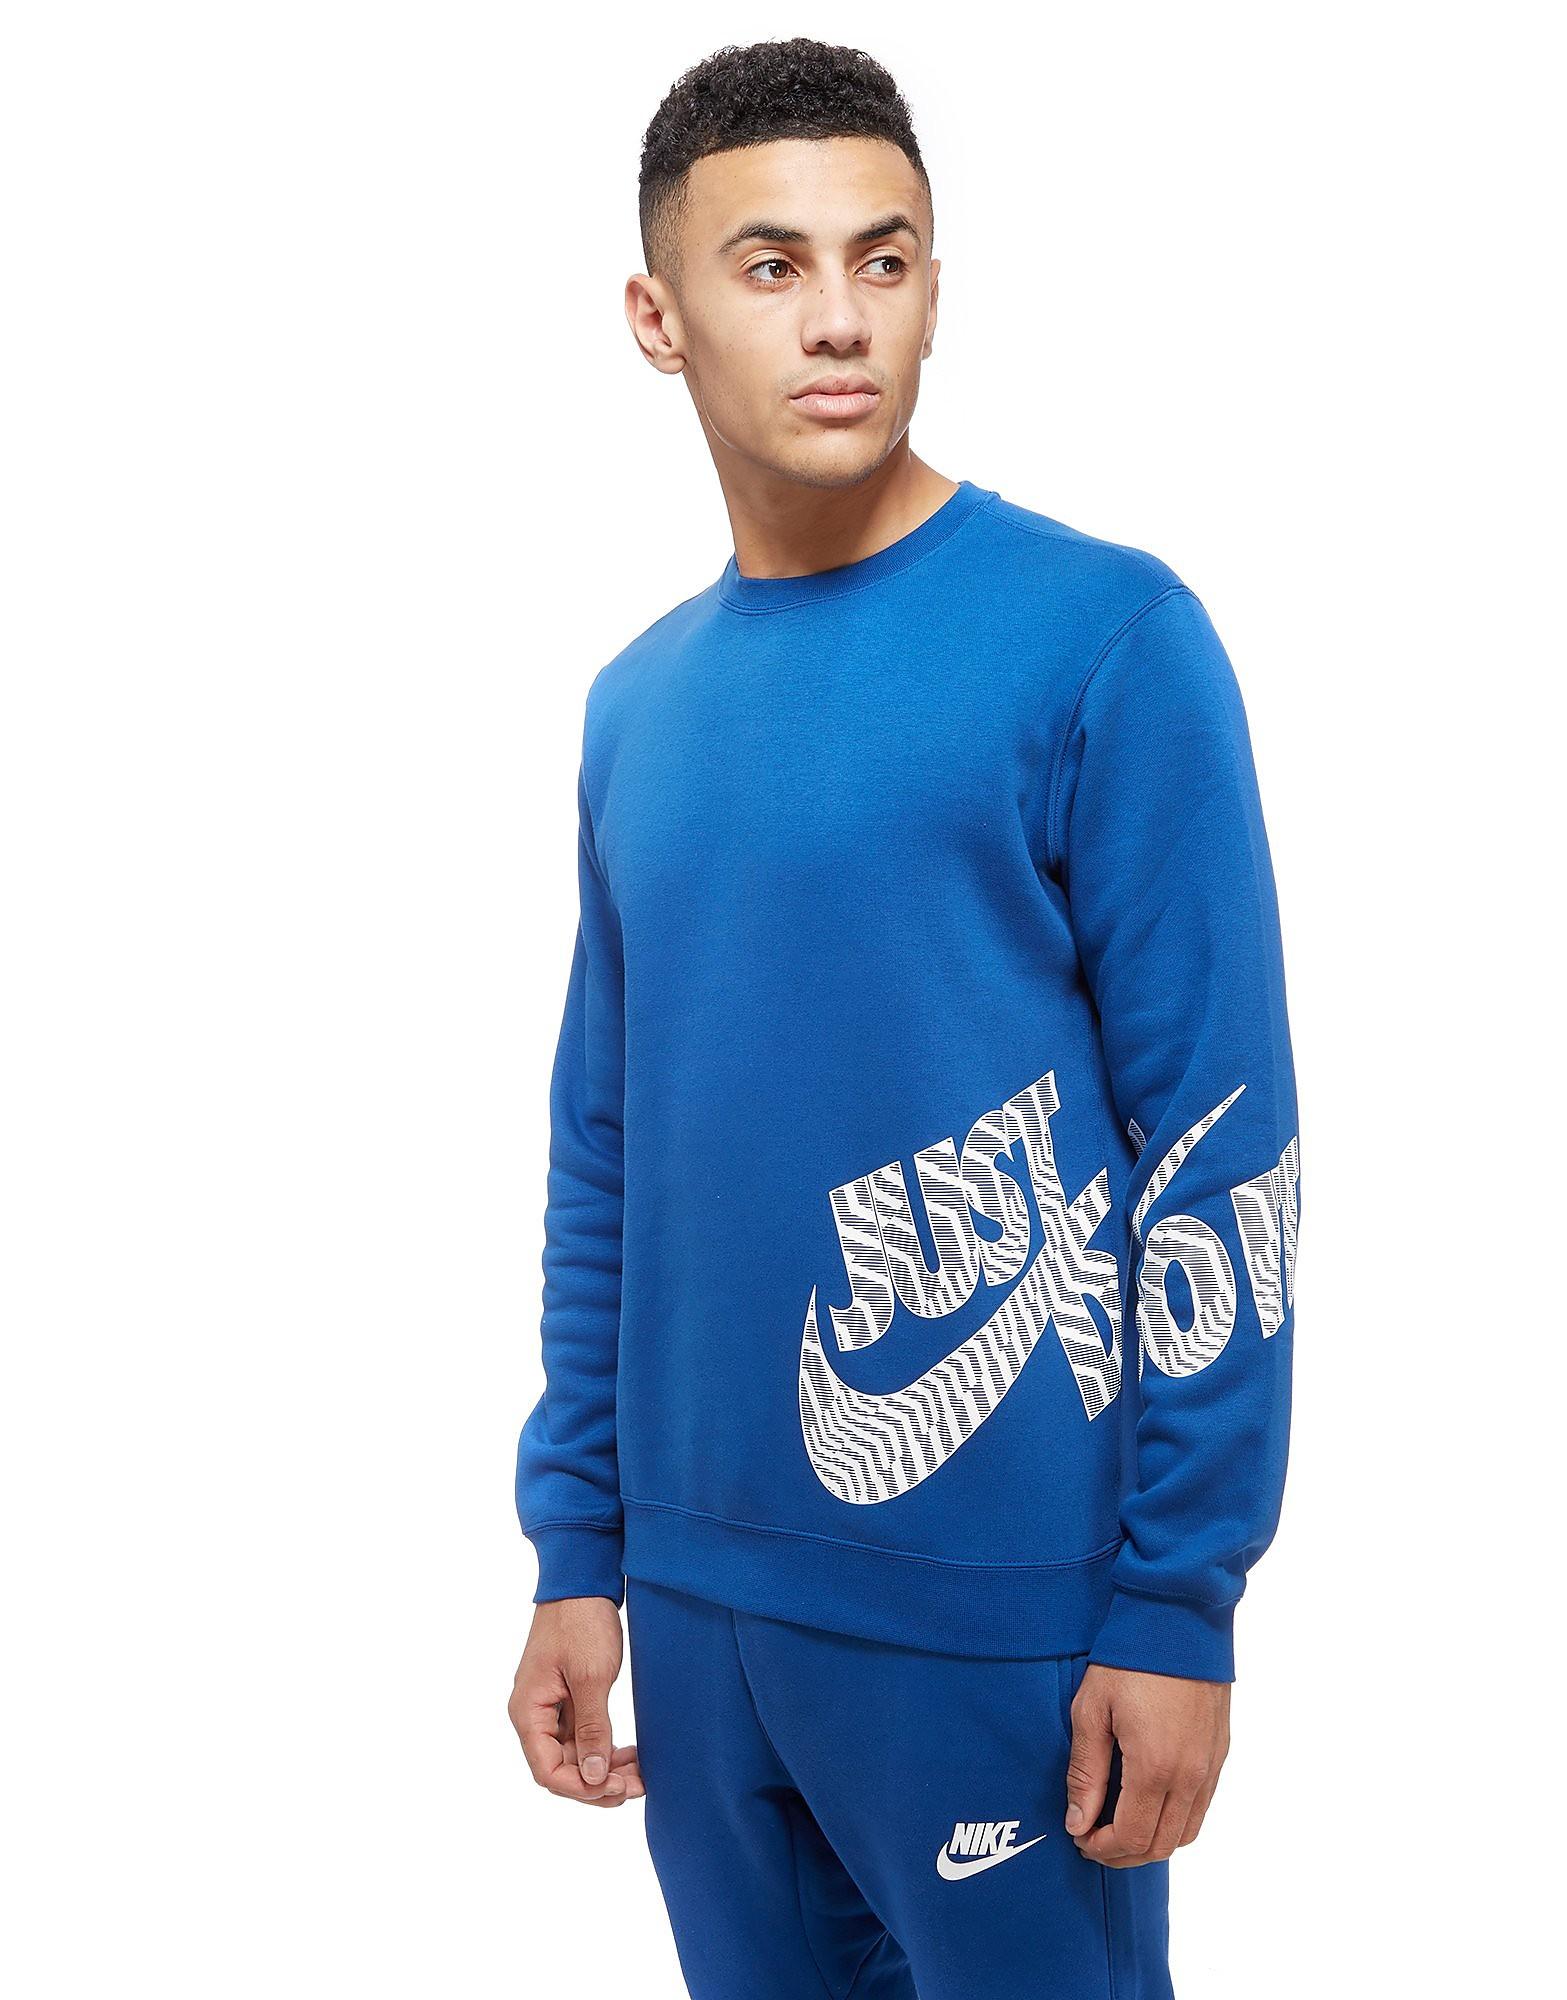 Nike Just Do It Logo Crew Sweatshirt